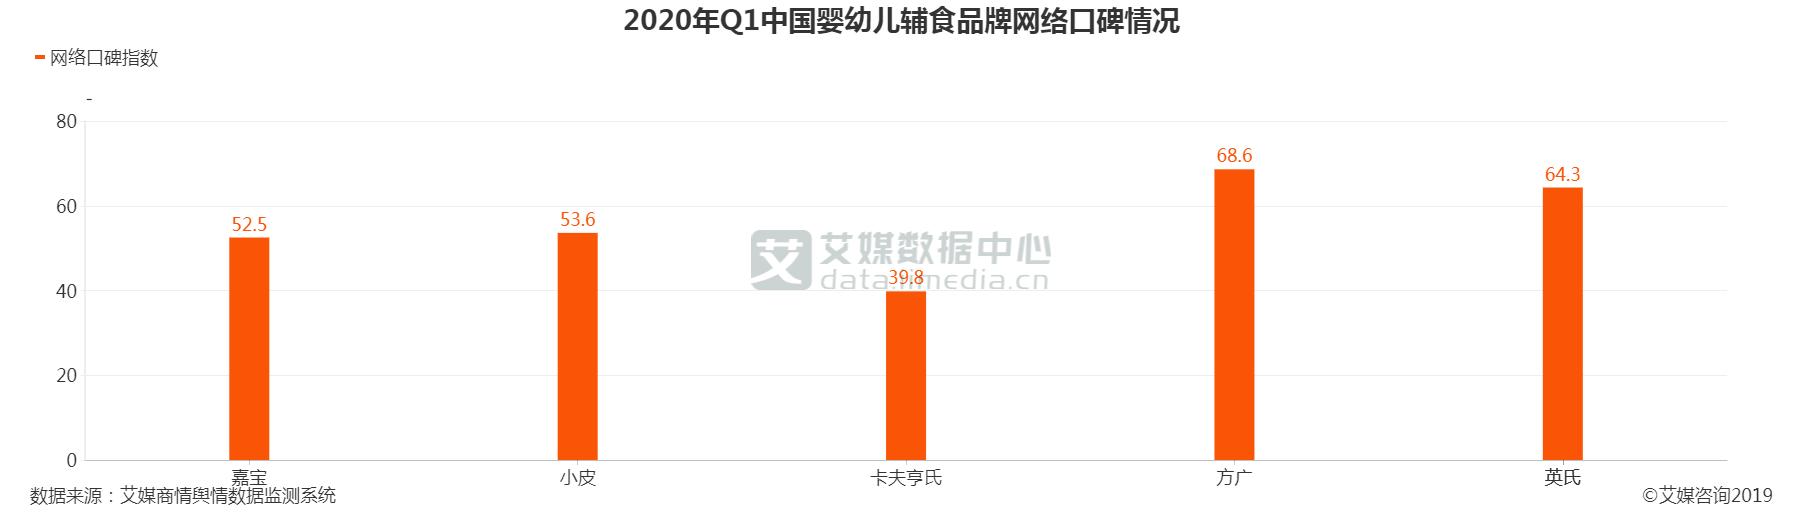 2020Q1中国婴幼儿辅食品牌网络口碑